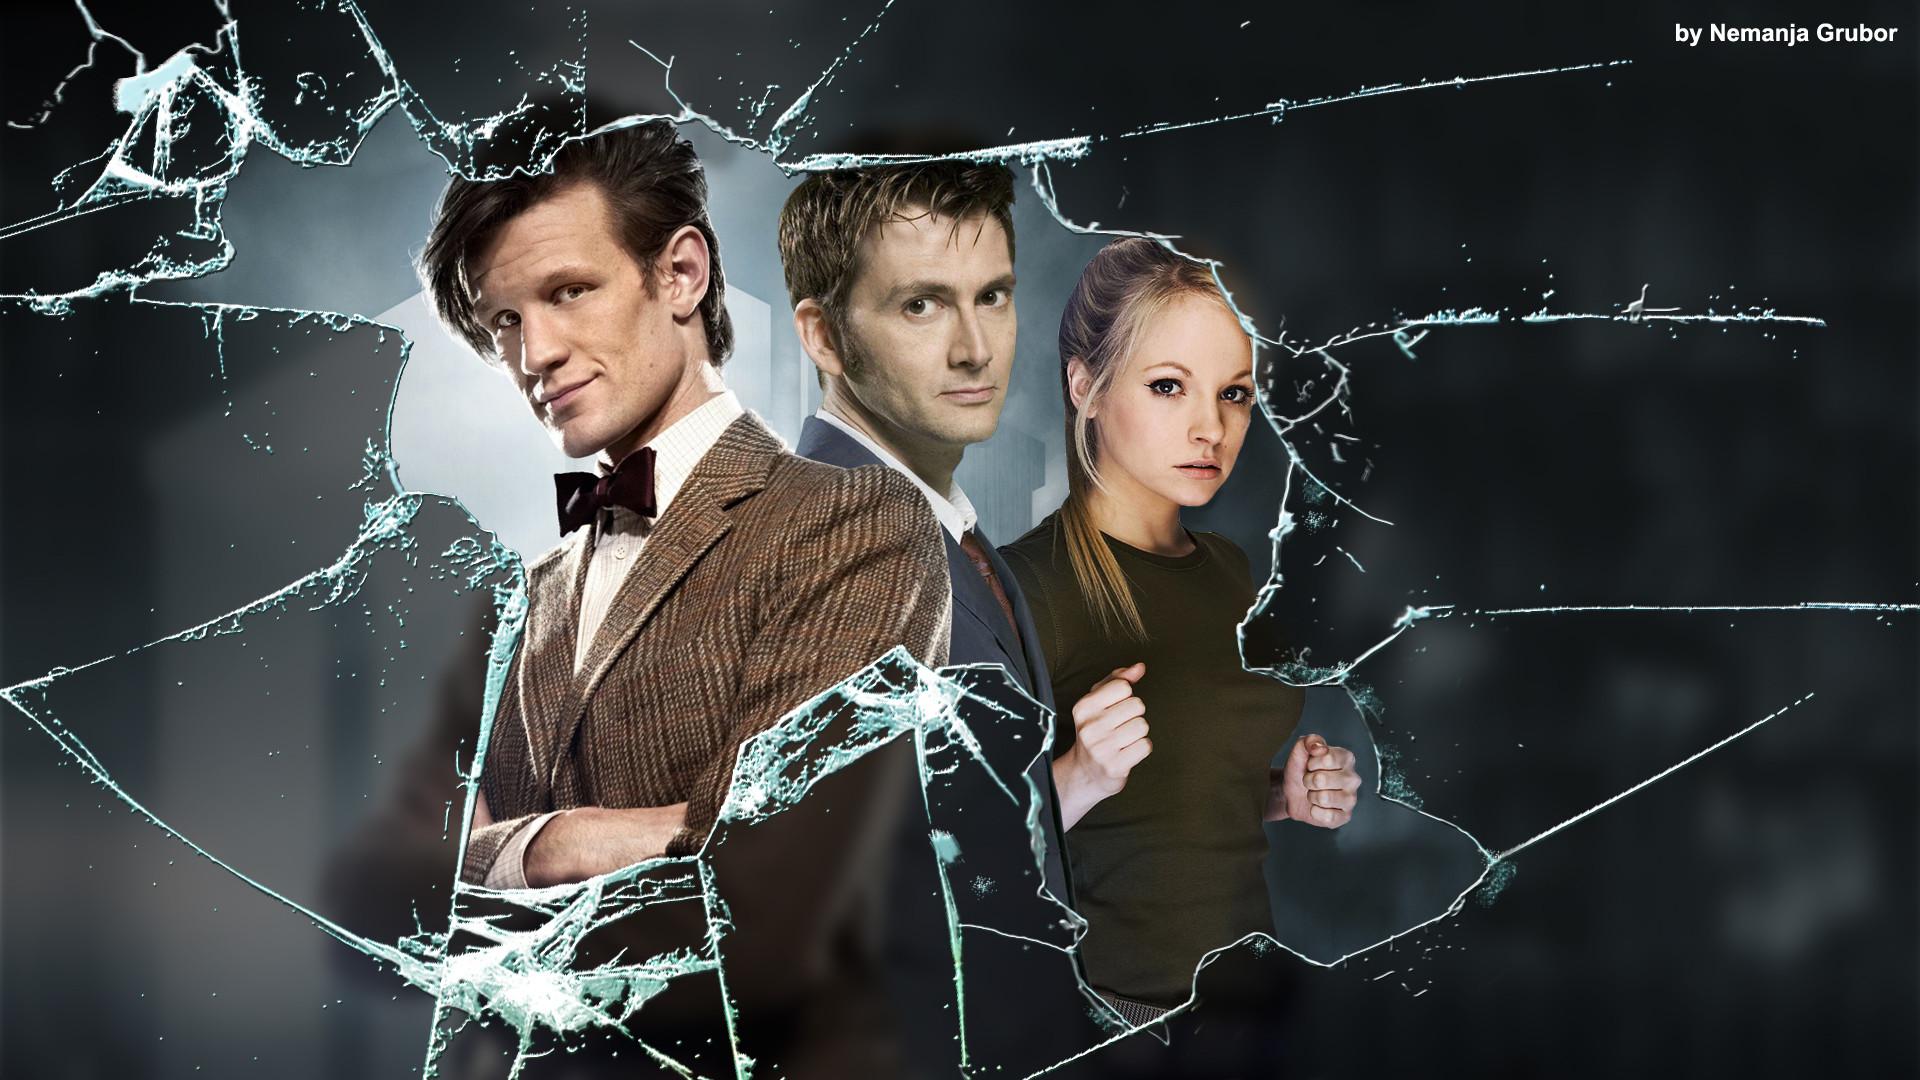 … Doctor Who broken glass wallpaper by ngrubor